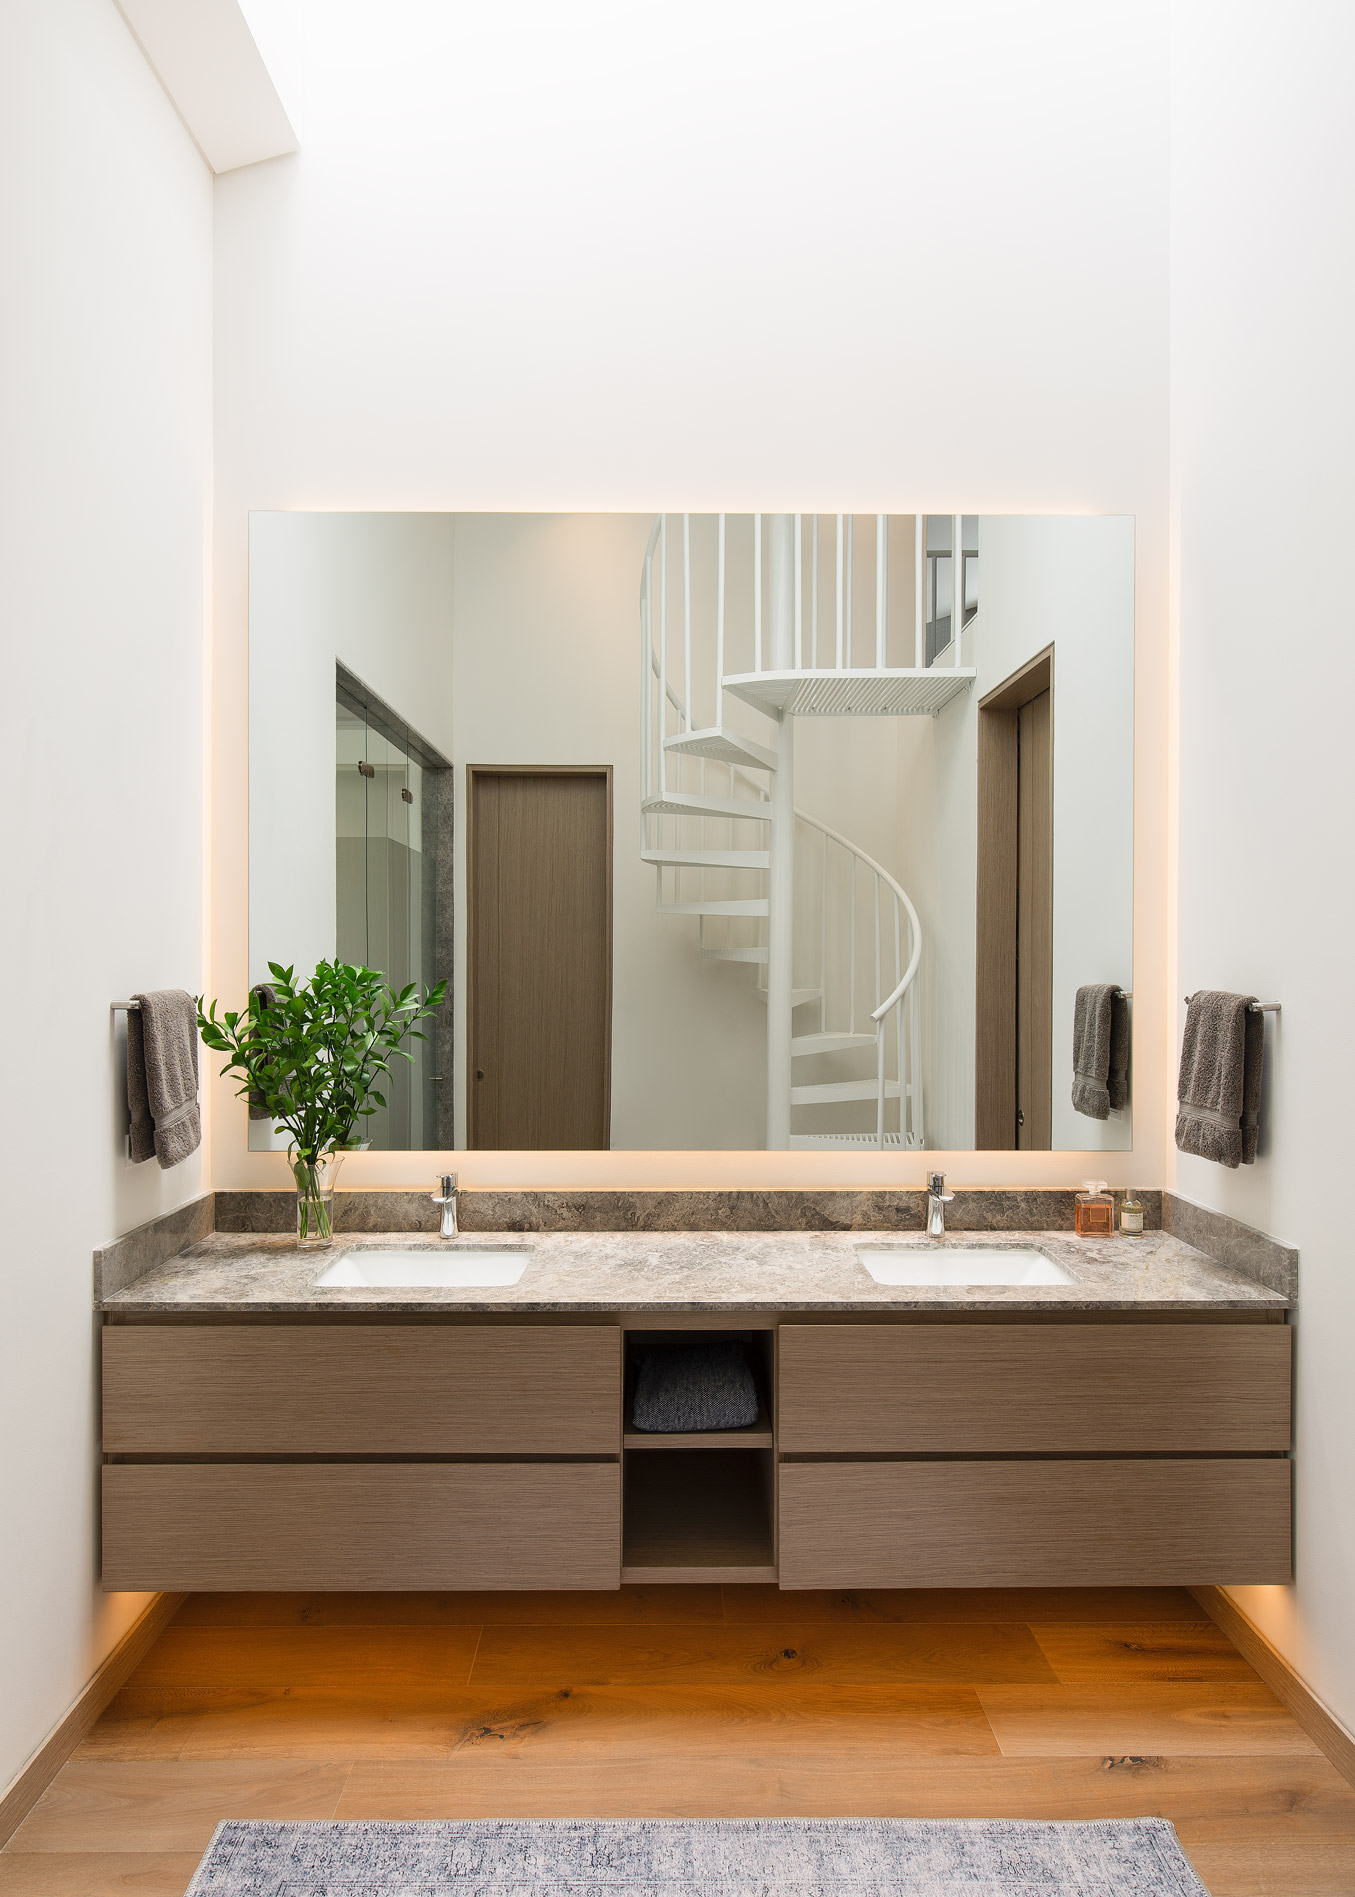 03.RLU.arquitectura.bogota.architecture.interior.simonboschphotography.virrey